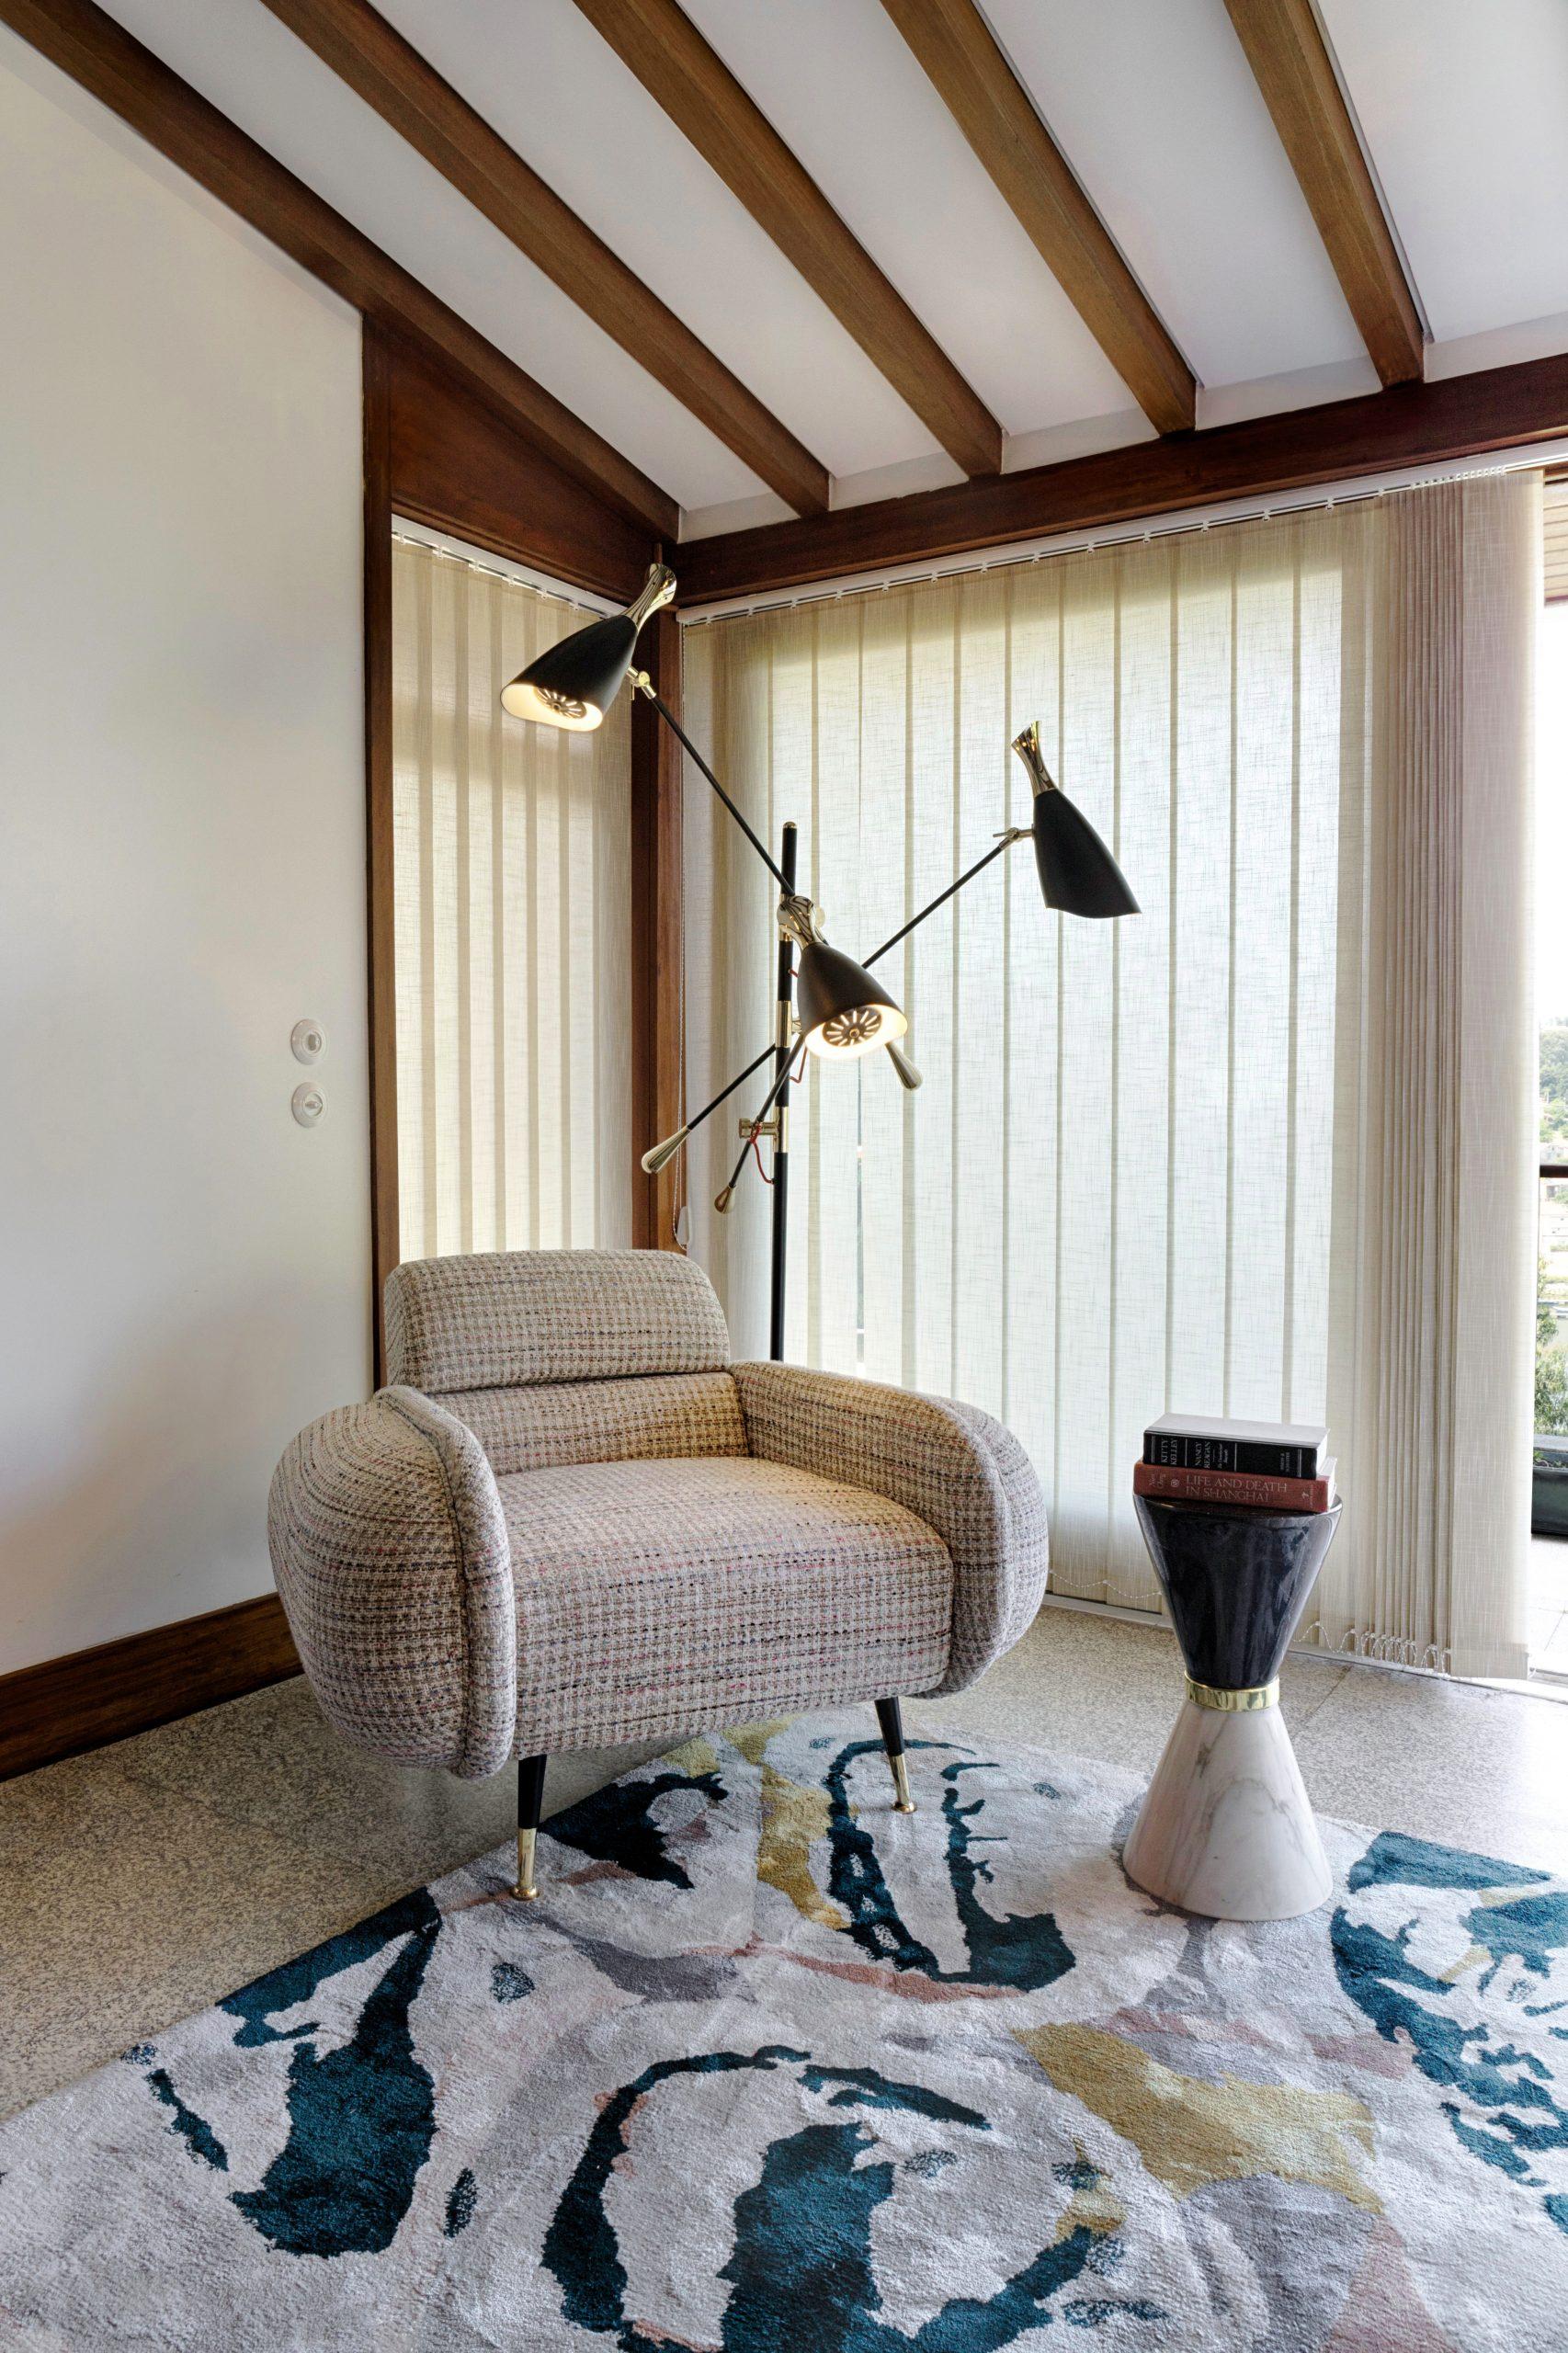 Trendy Living Room Designs For Mid-Century Modern Lovers